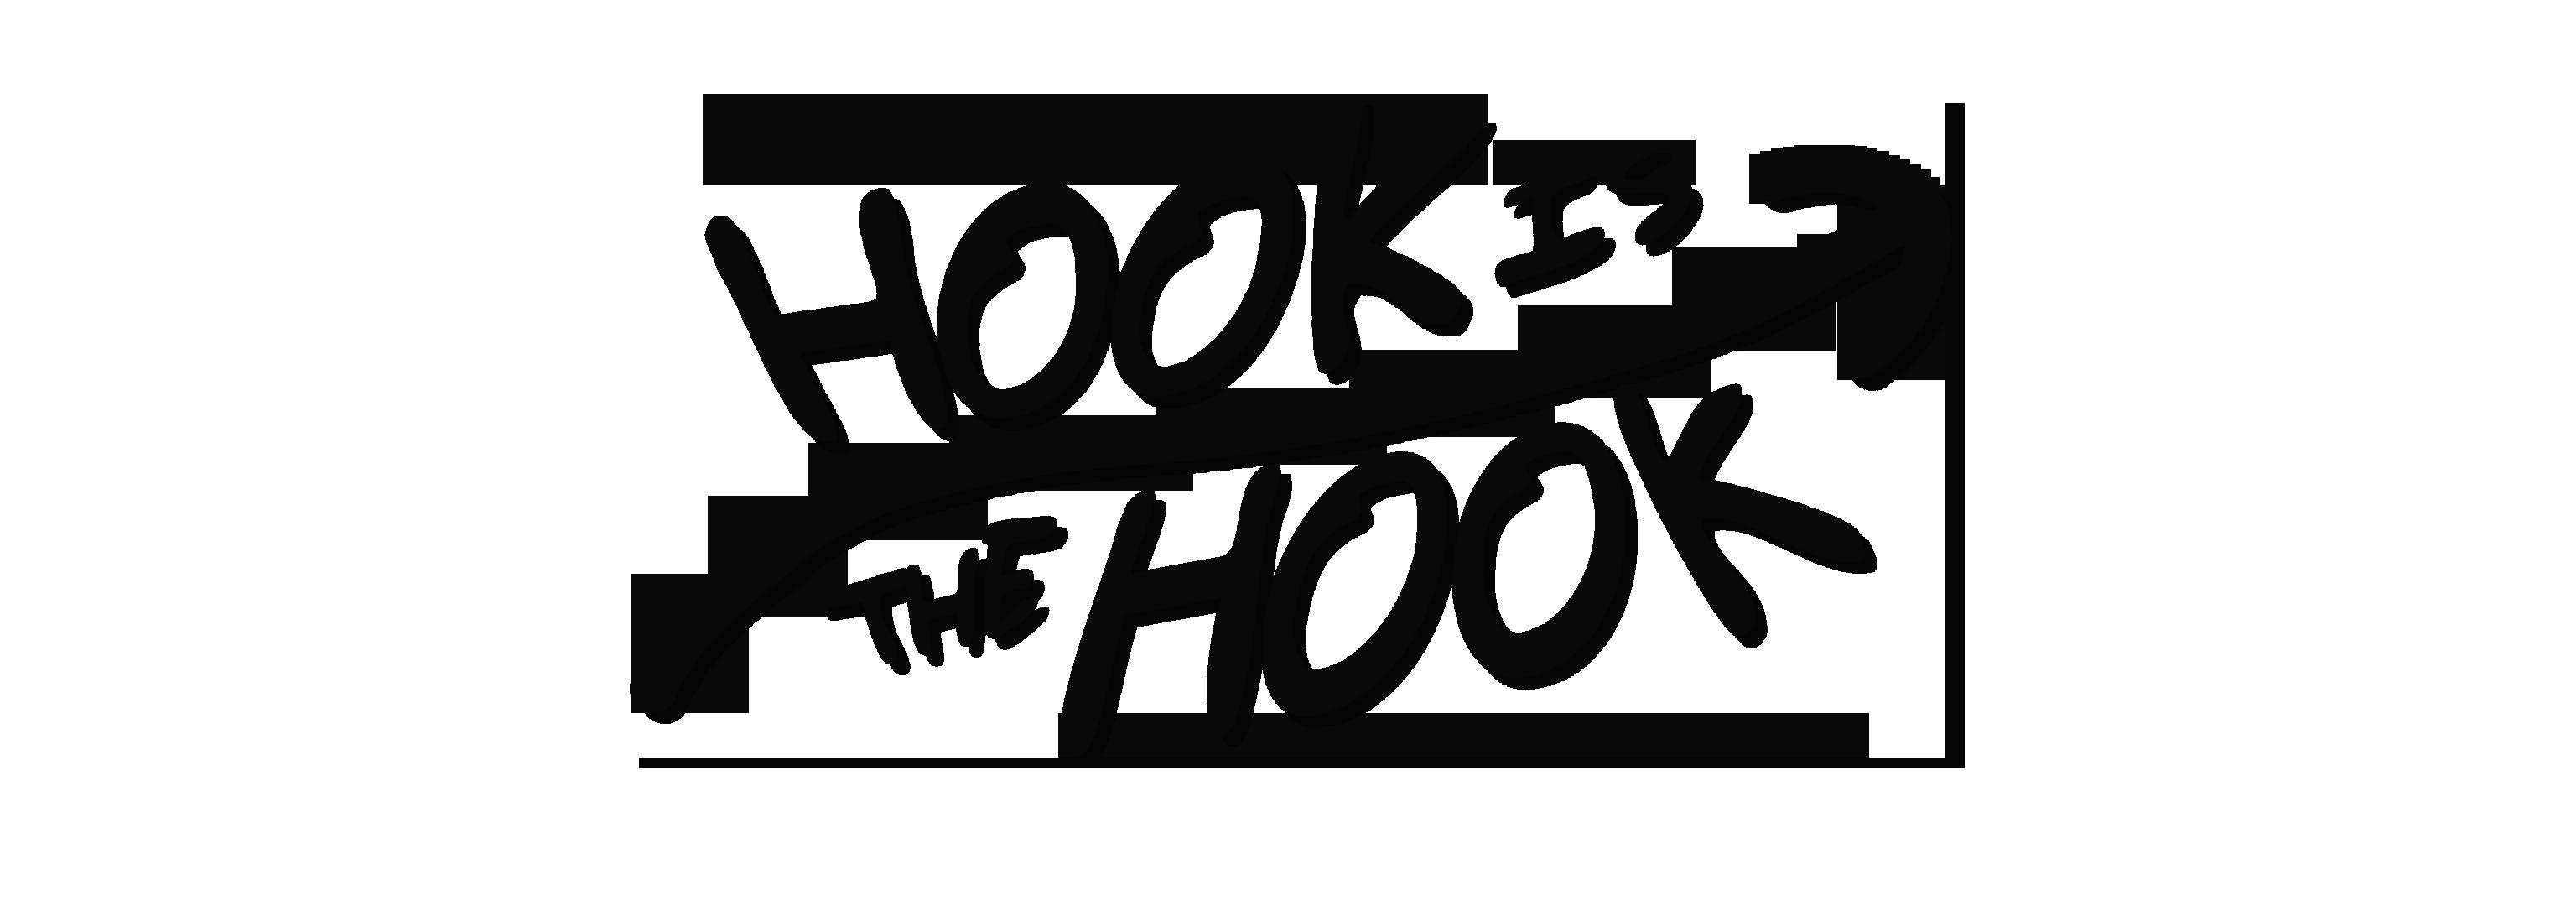 Hook is the Hook